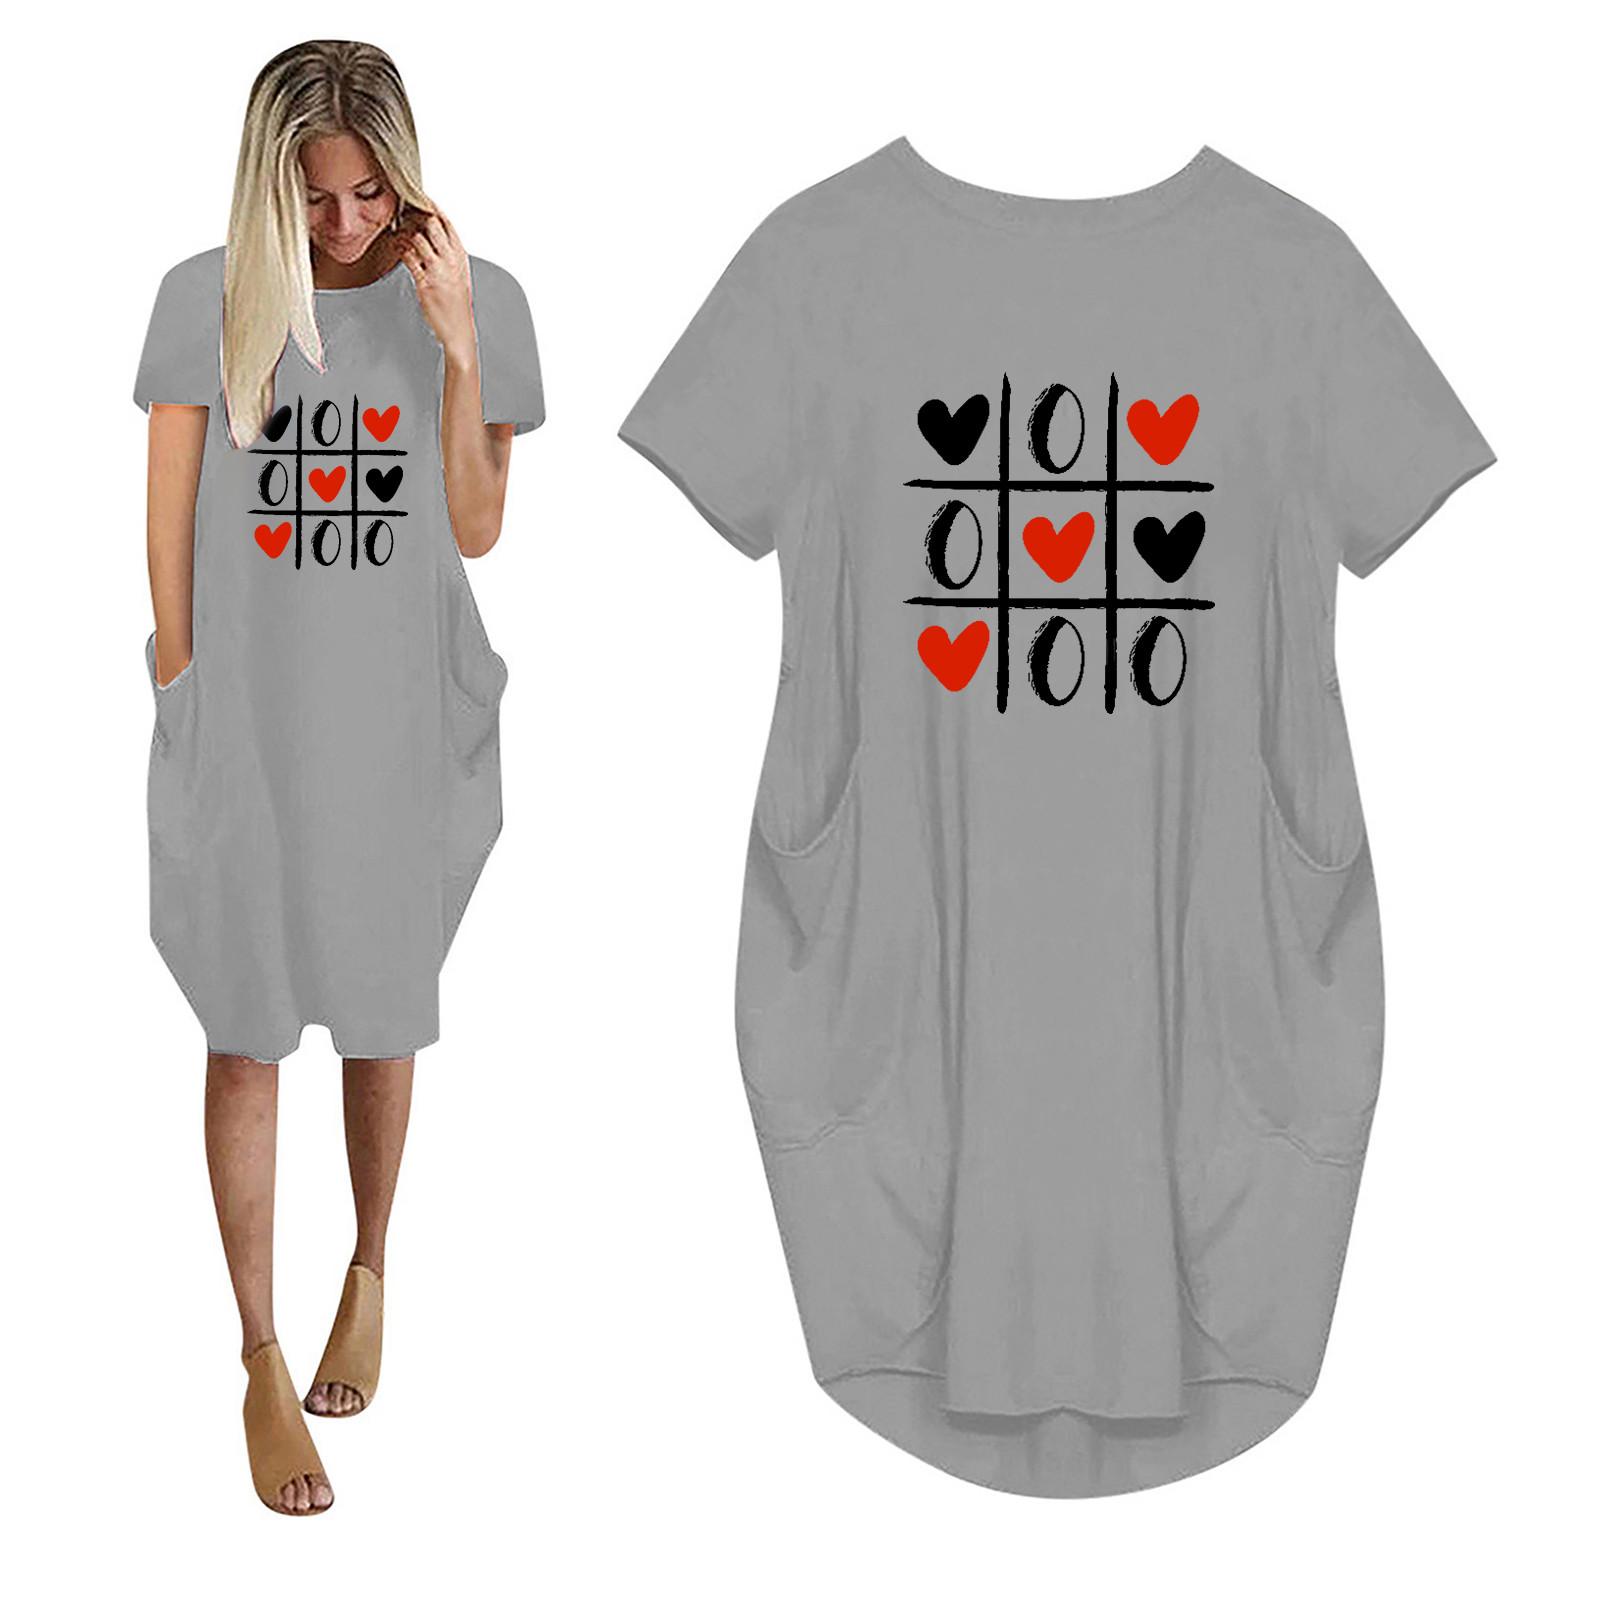 40# Love Printing Casual Pocket Women's Drees Short Sleeve O  Neck Office Lady Summer Dresses For Women 2021 Платья Для Женщин